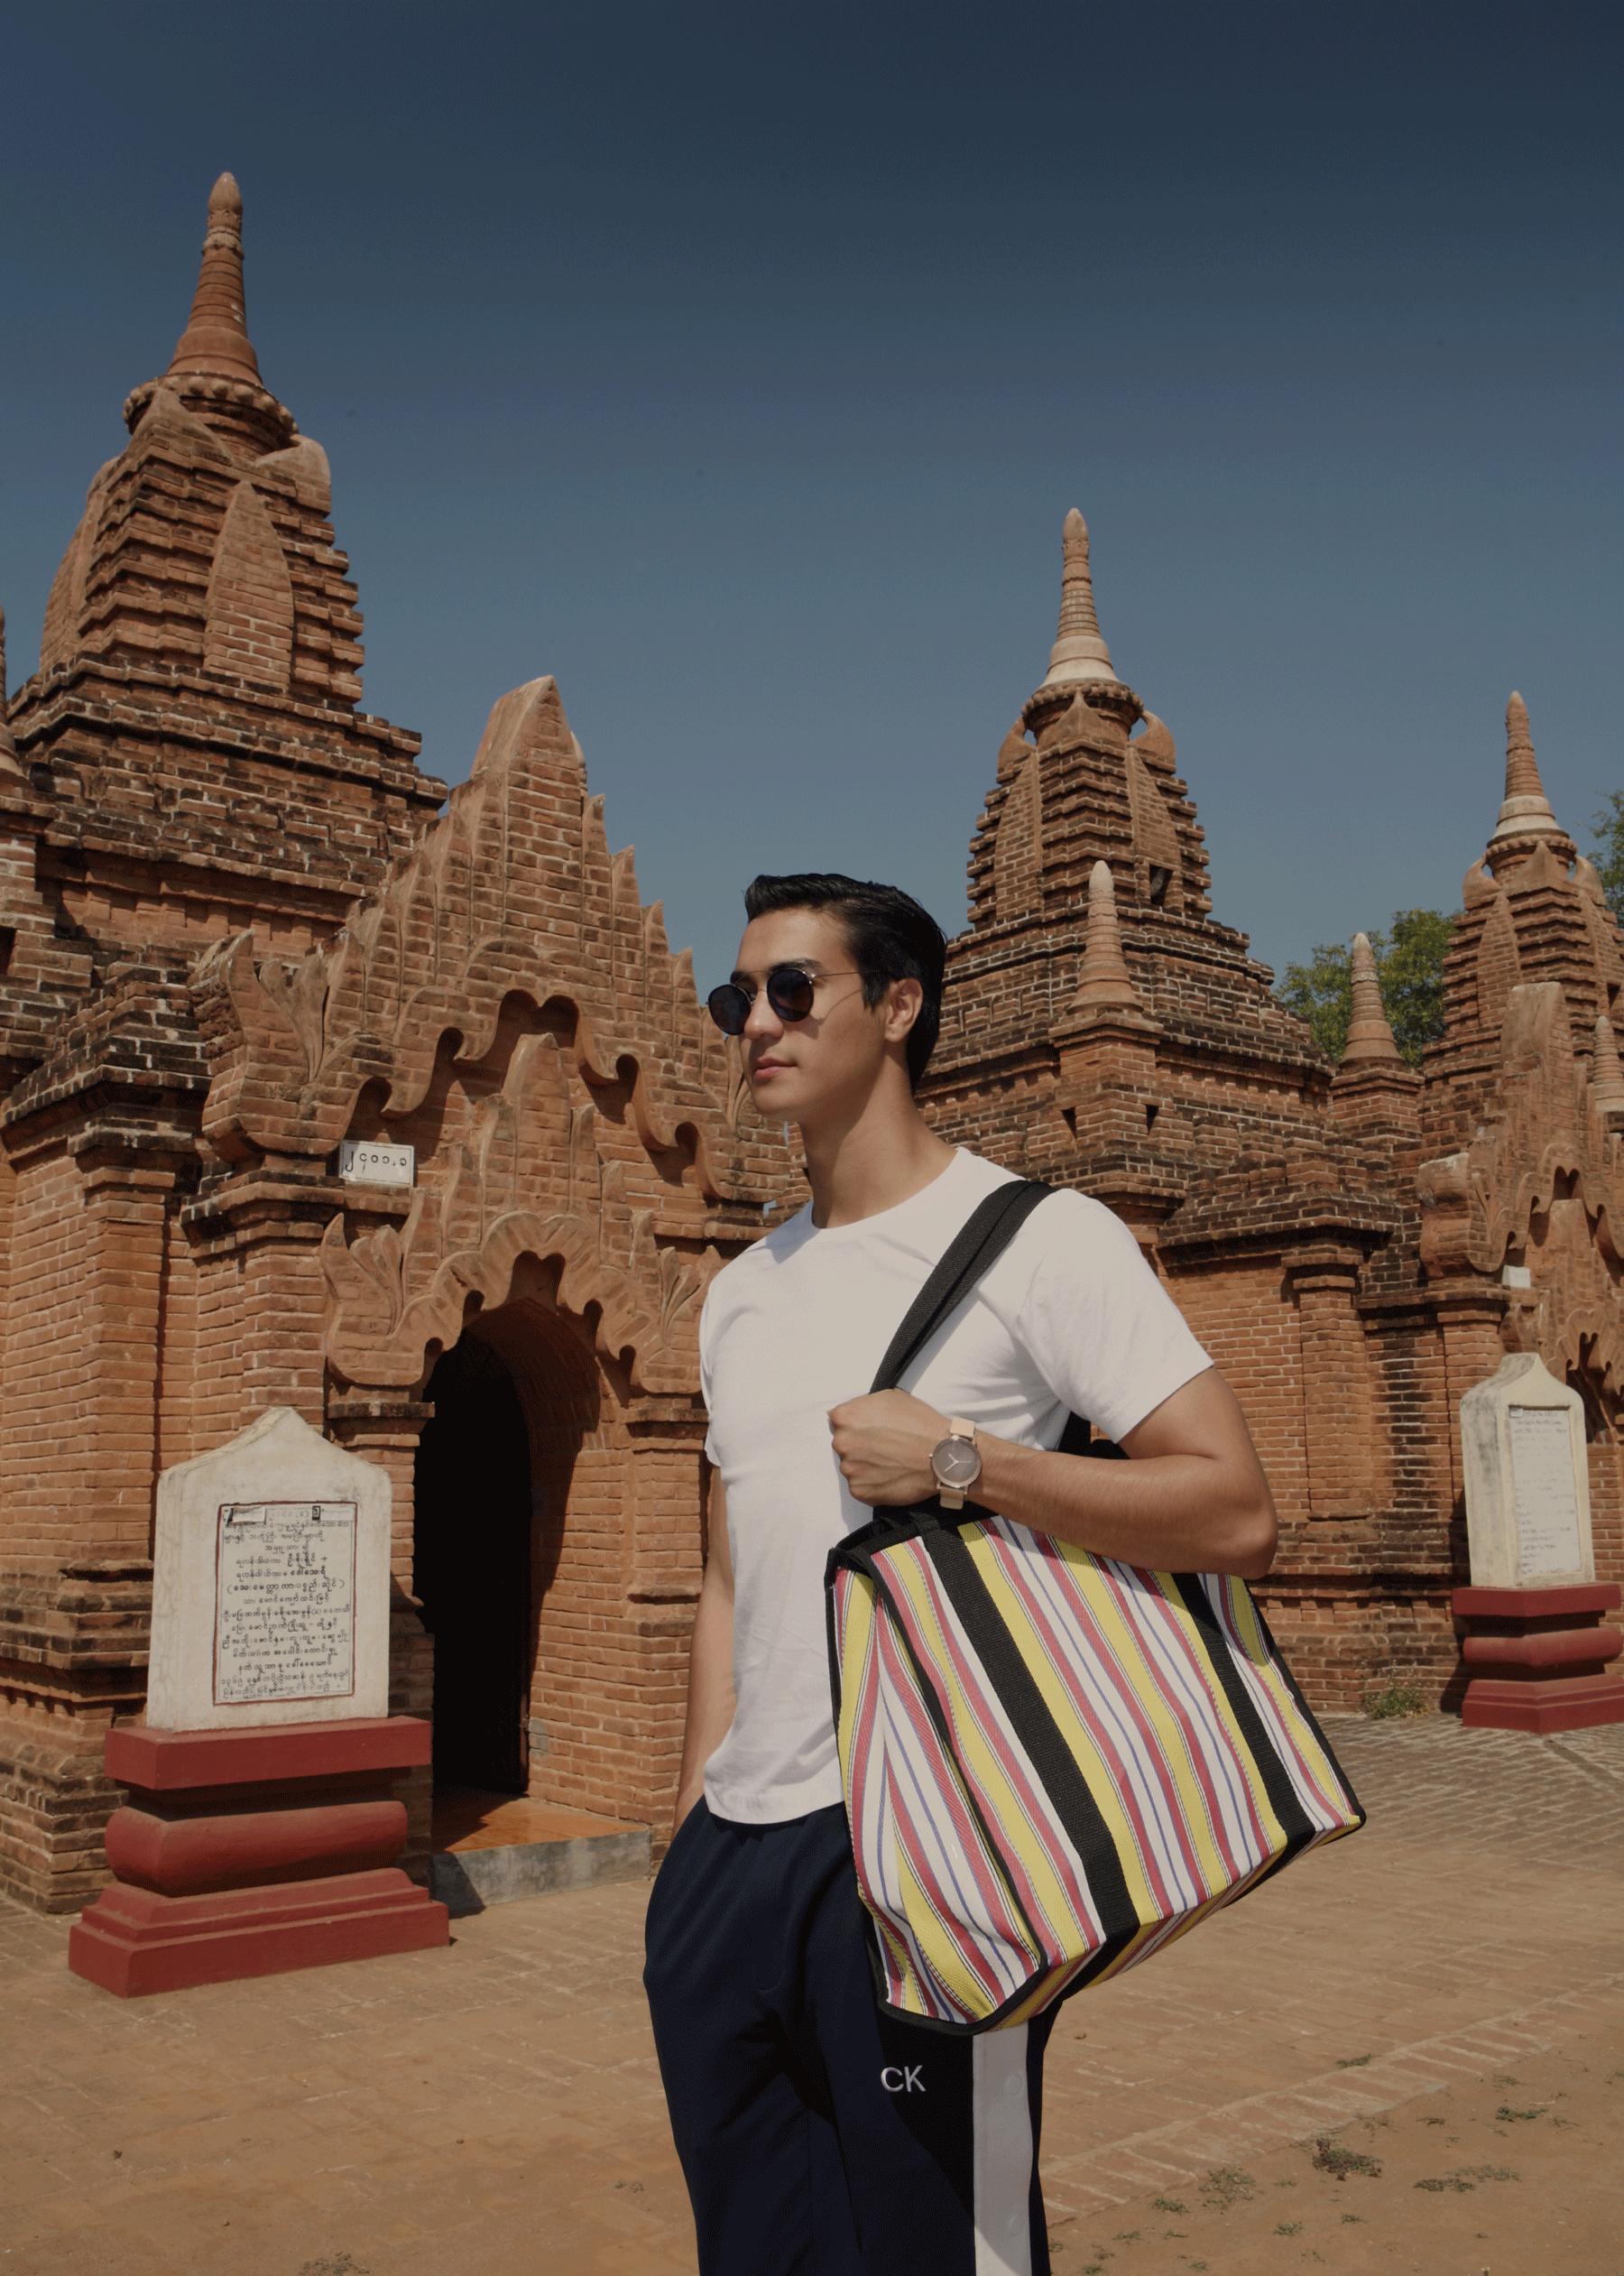 Khaymingha Temple - Bagan  Tshirt : JOCKEY / pants : CK Calvin Klein / watch : FORREST / sunglasses : SPEKTRE / bag : Red Modeling